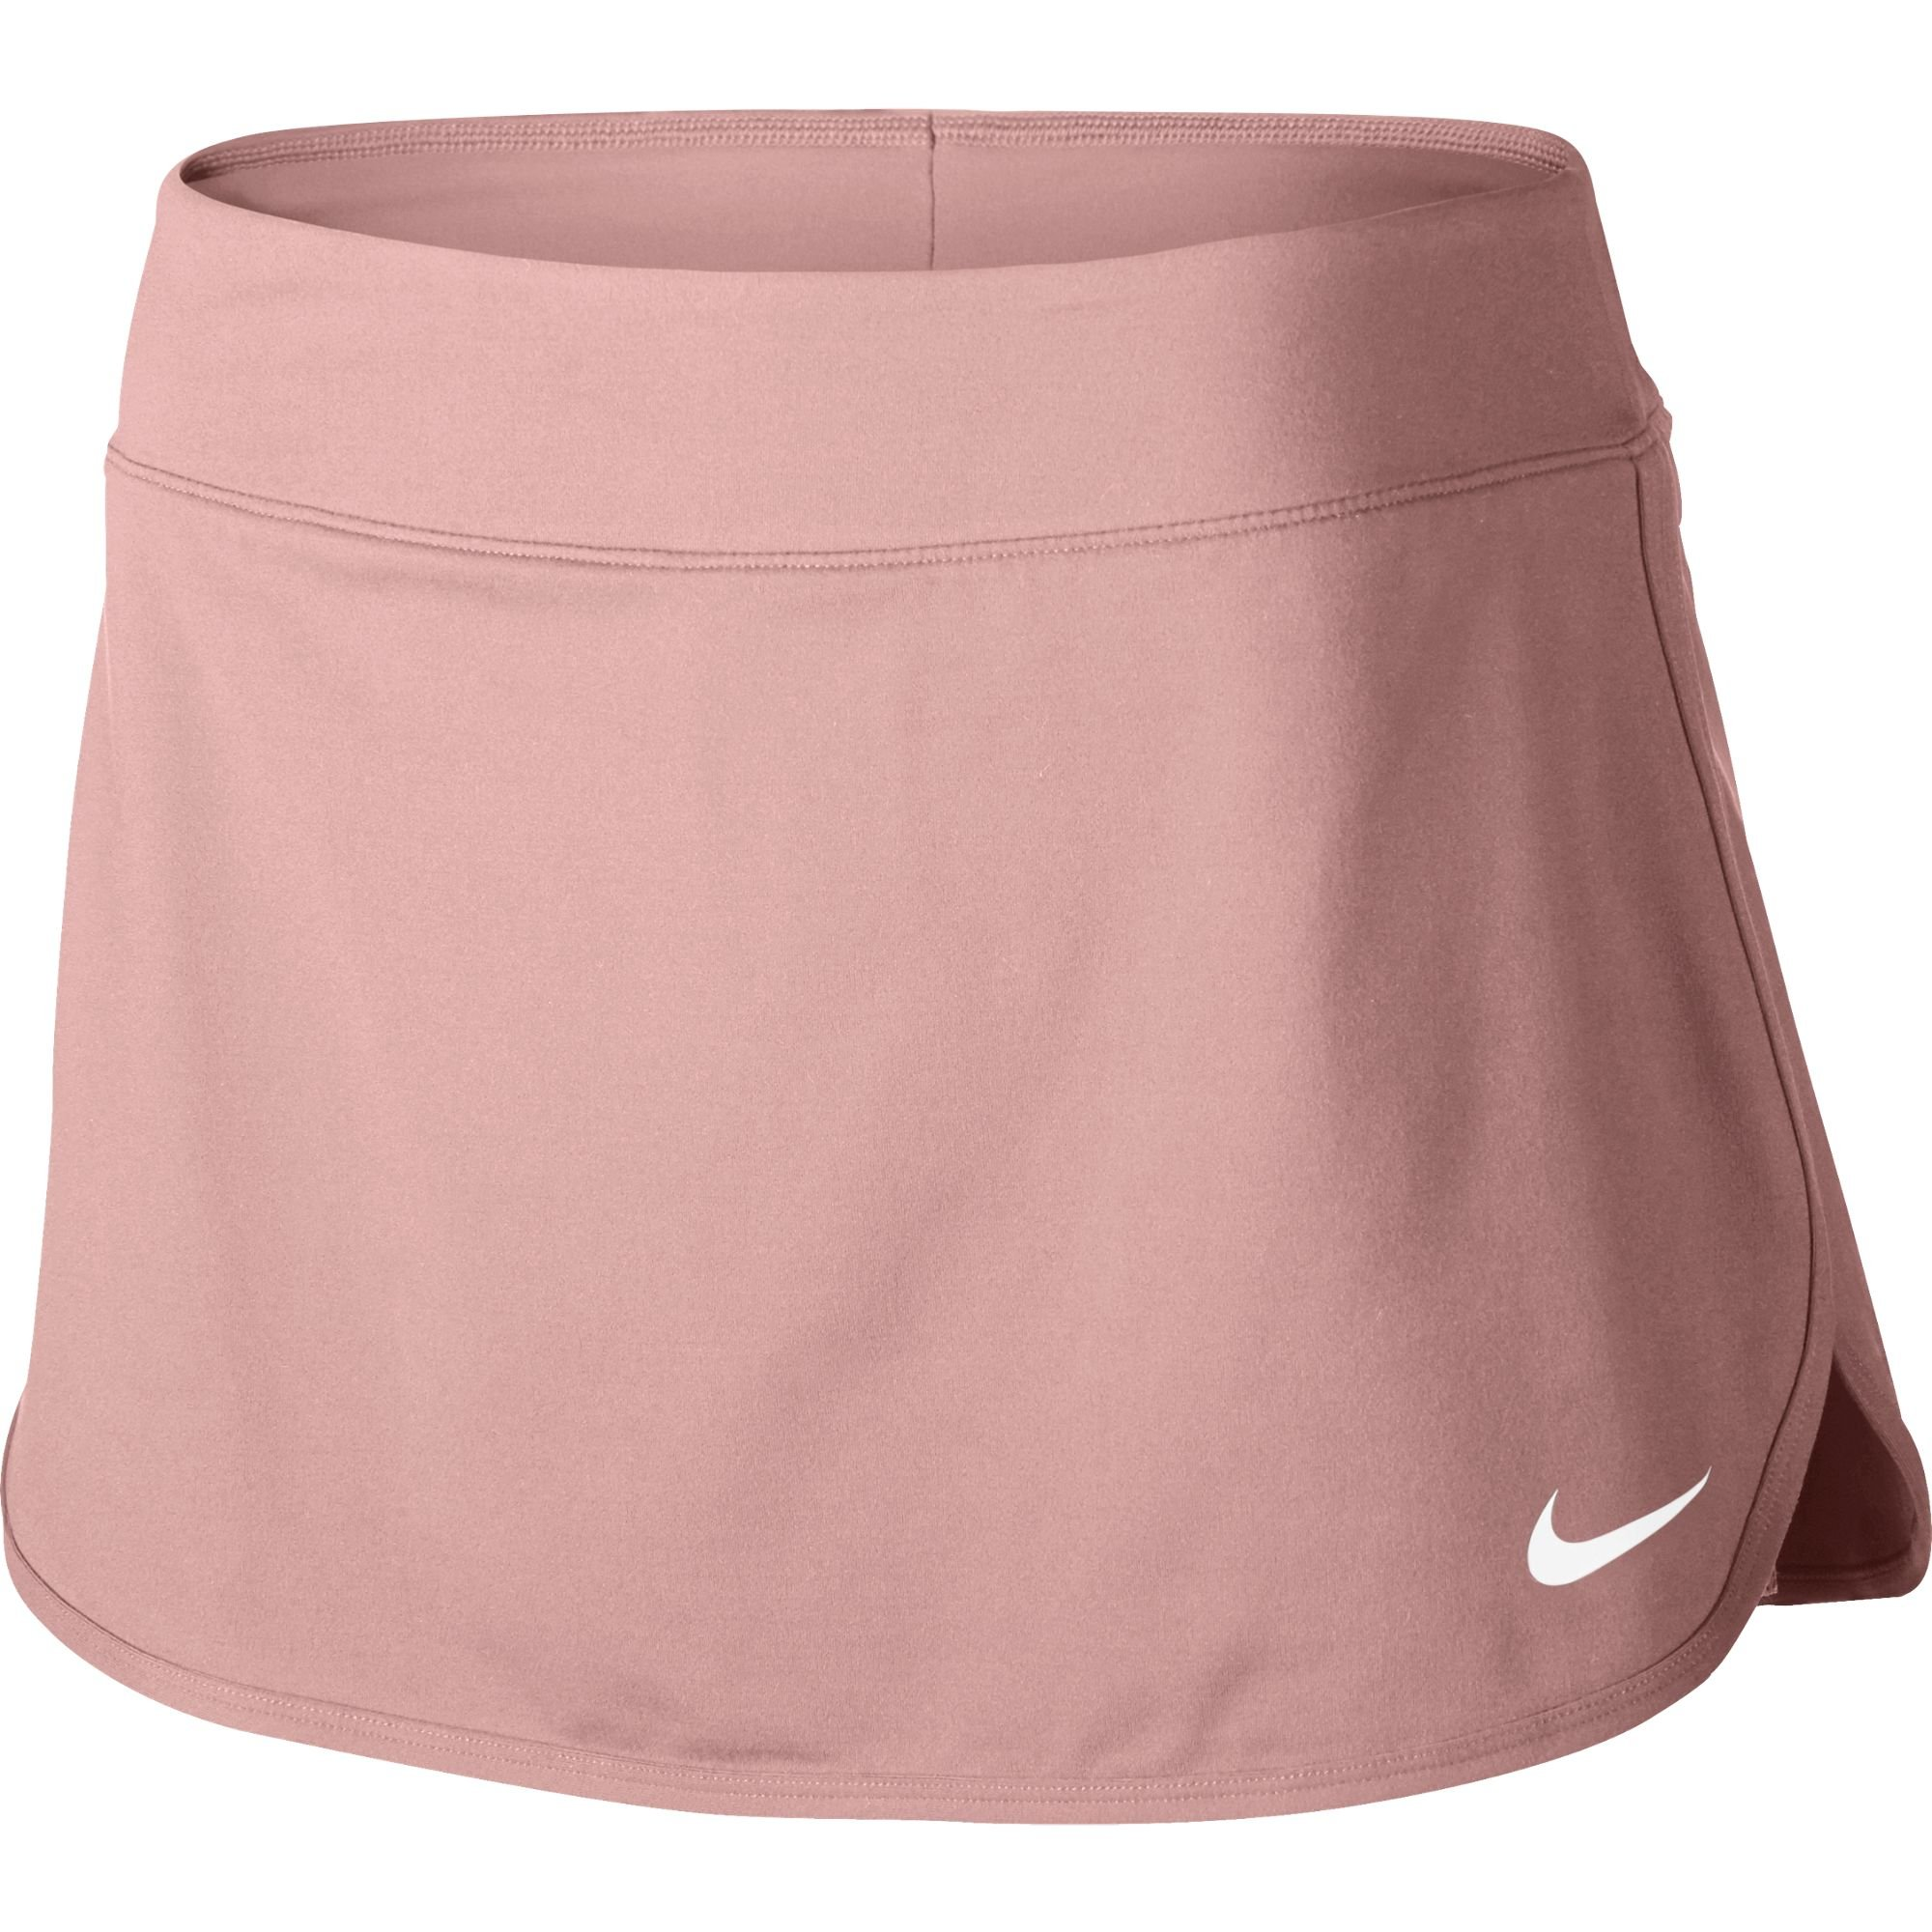 W NKCT Pure Skirt Women's Tennis Skirt